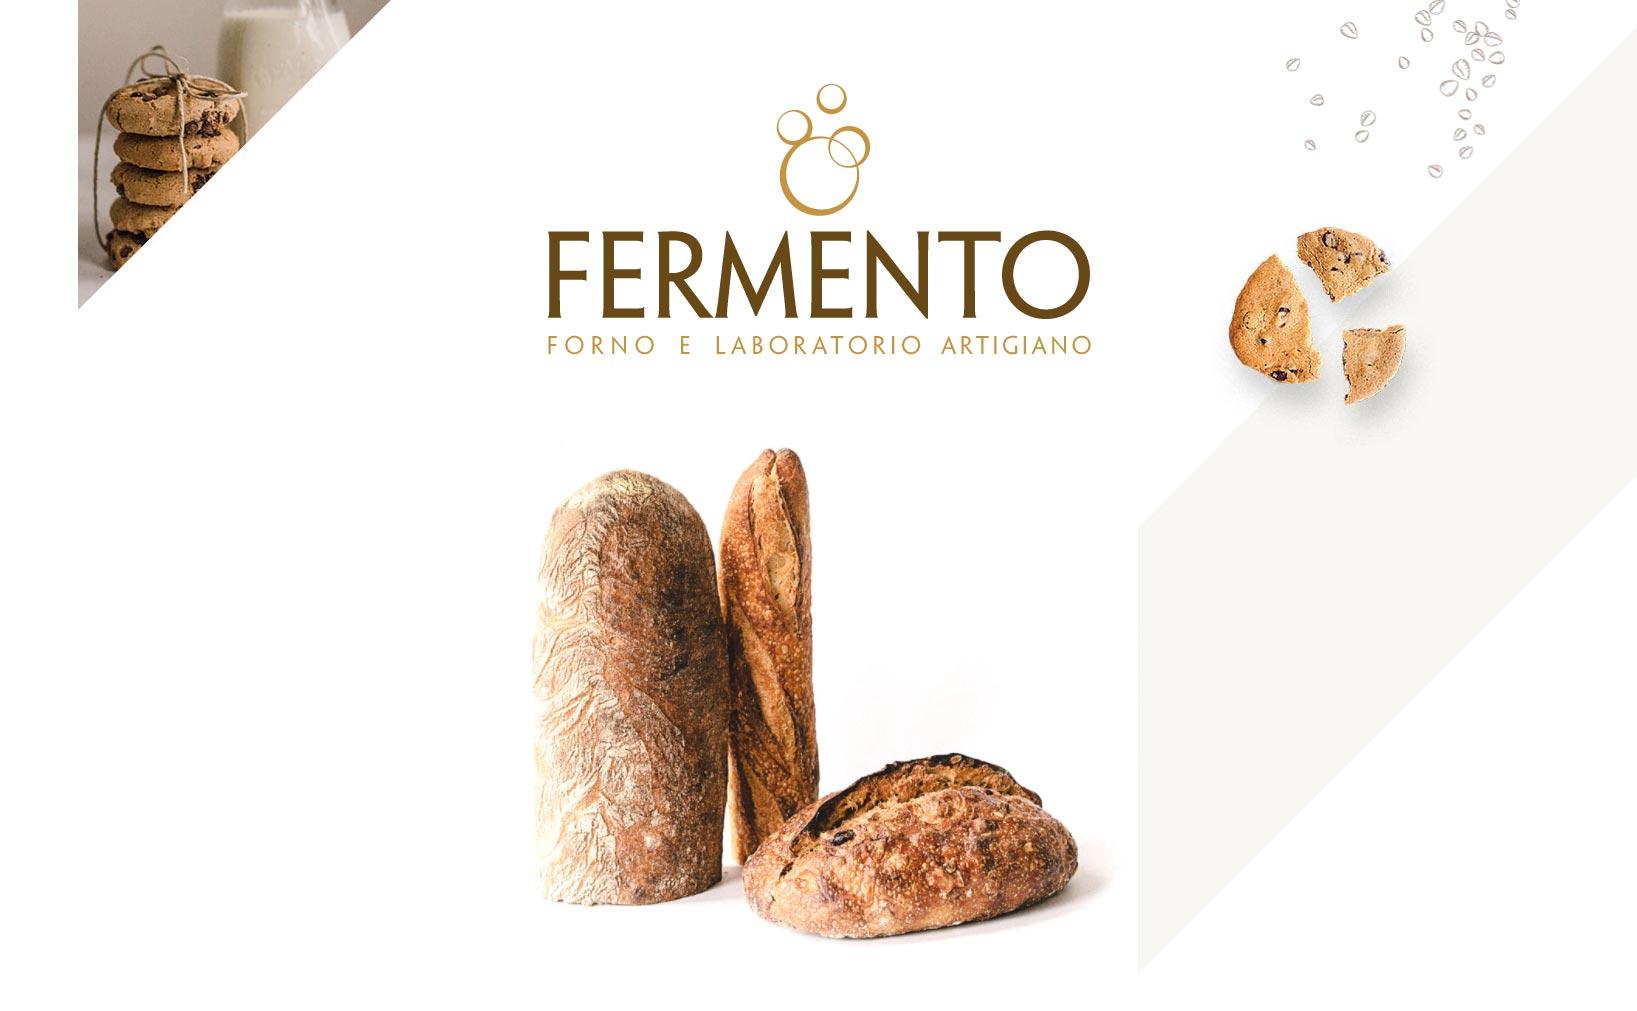 fermentolab.it